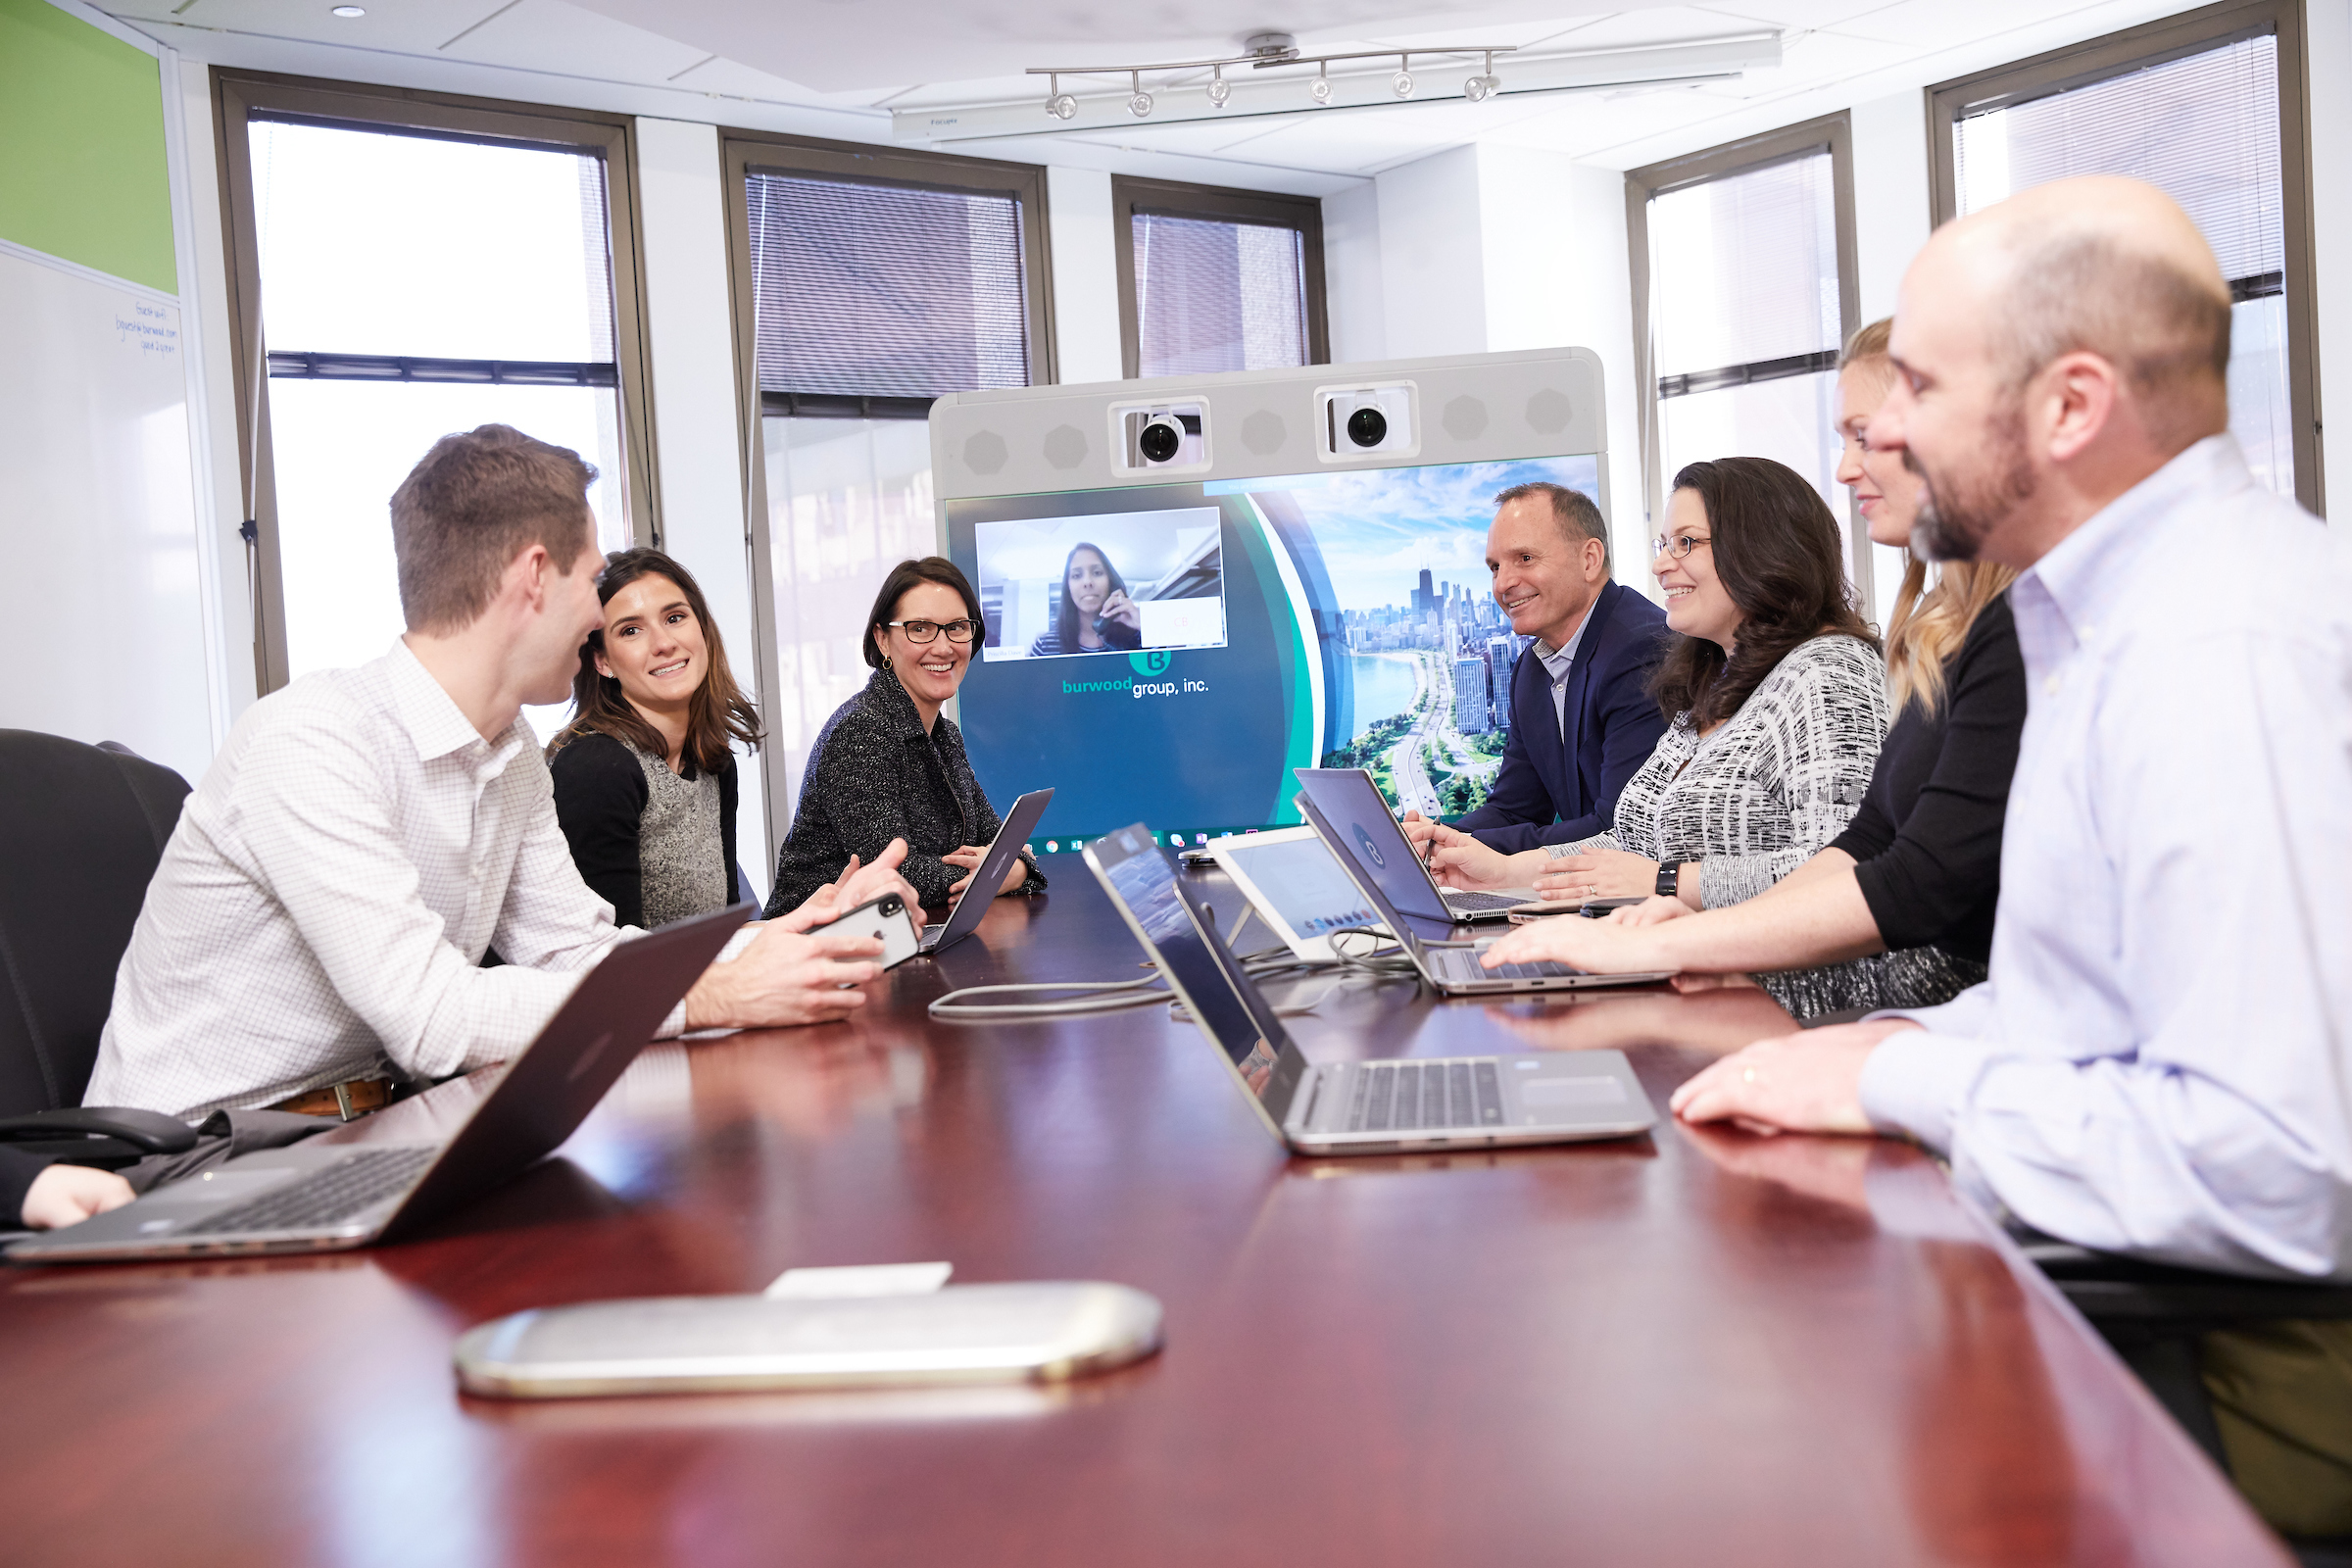 Burwood Group-best workplaces millennials 2019